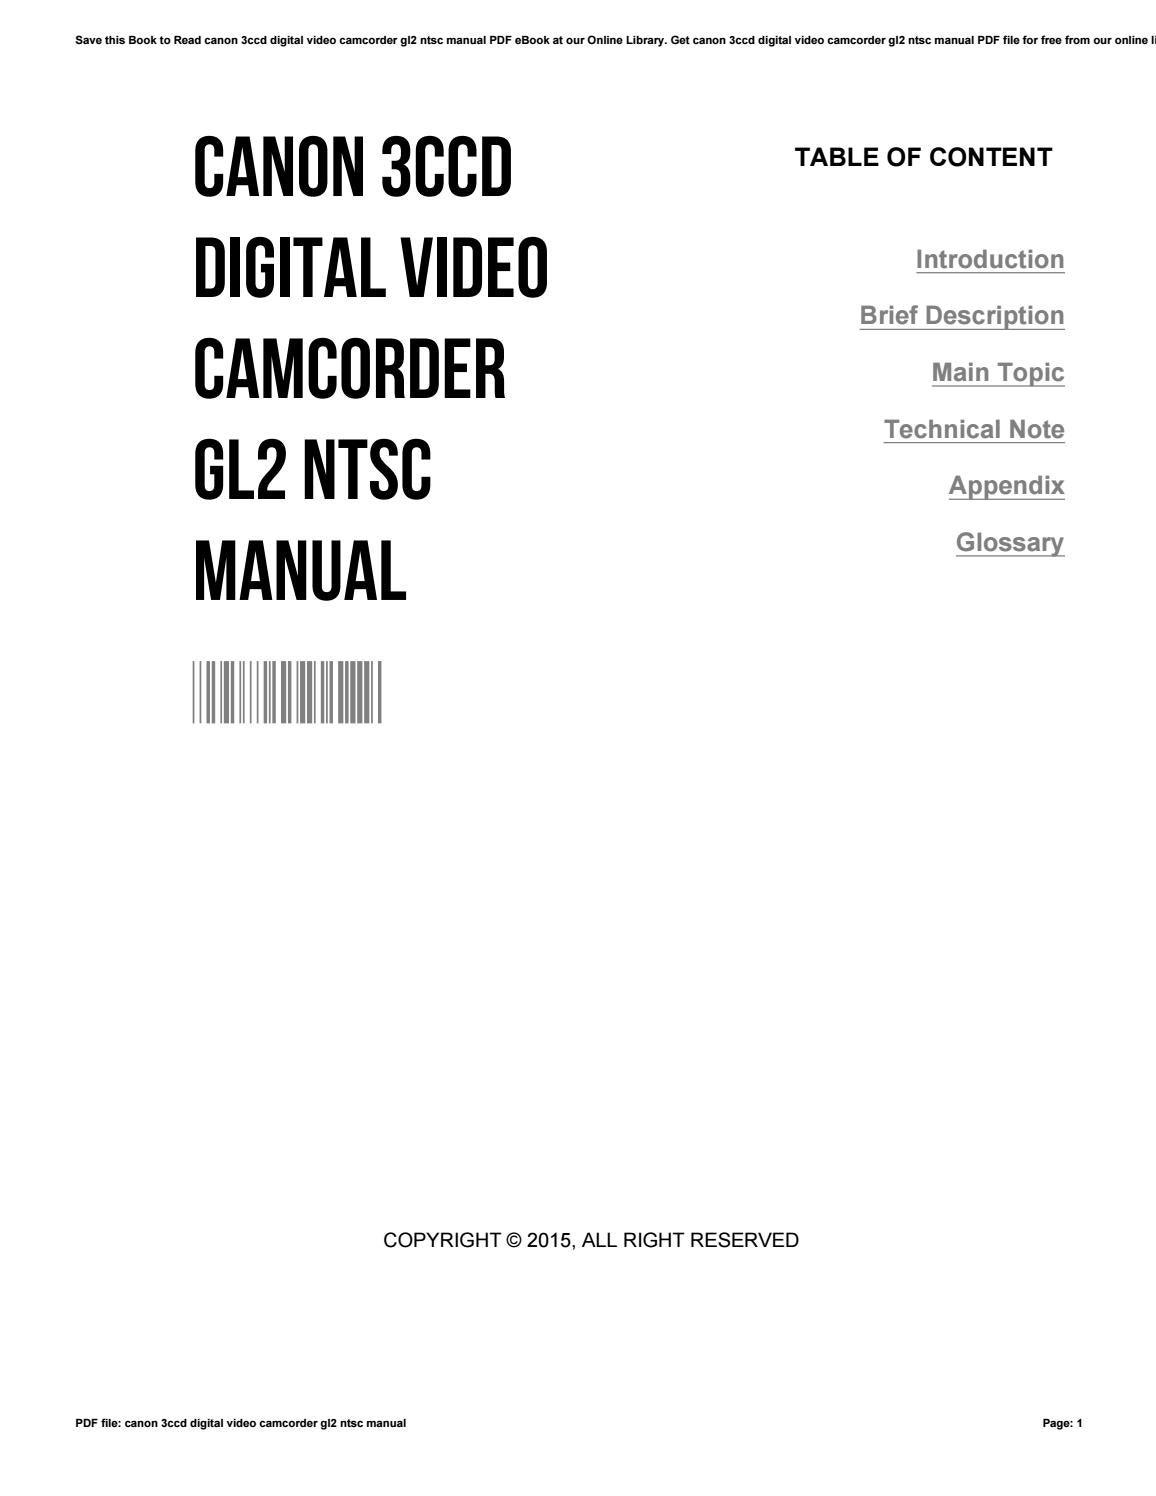 canon 3ccd digital video camcorder gl1 ntsc manual